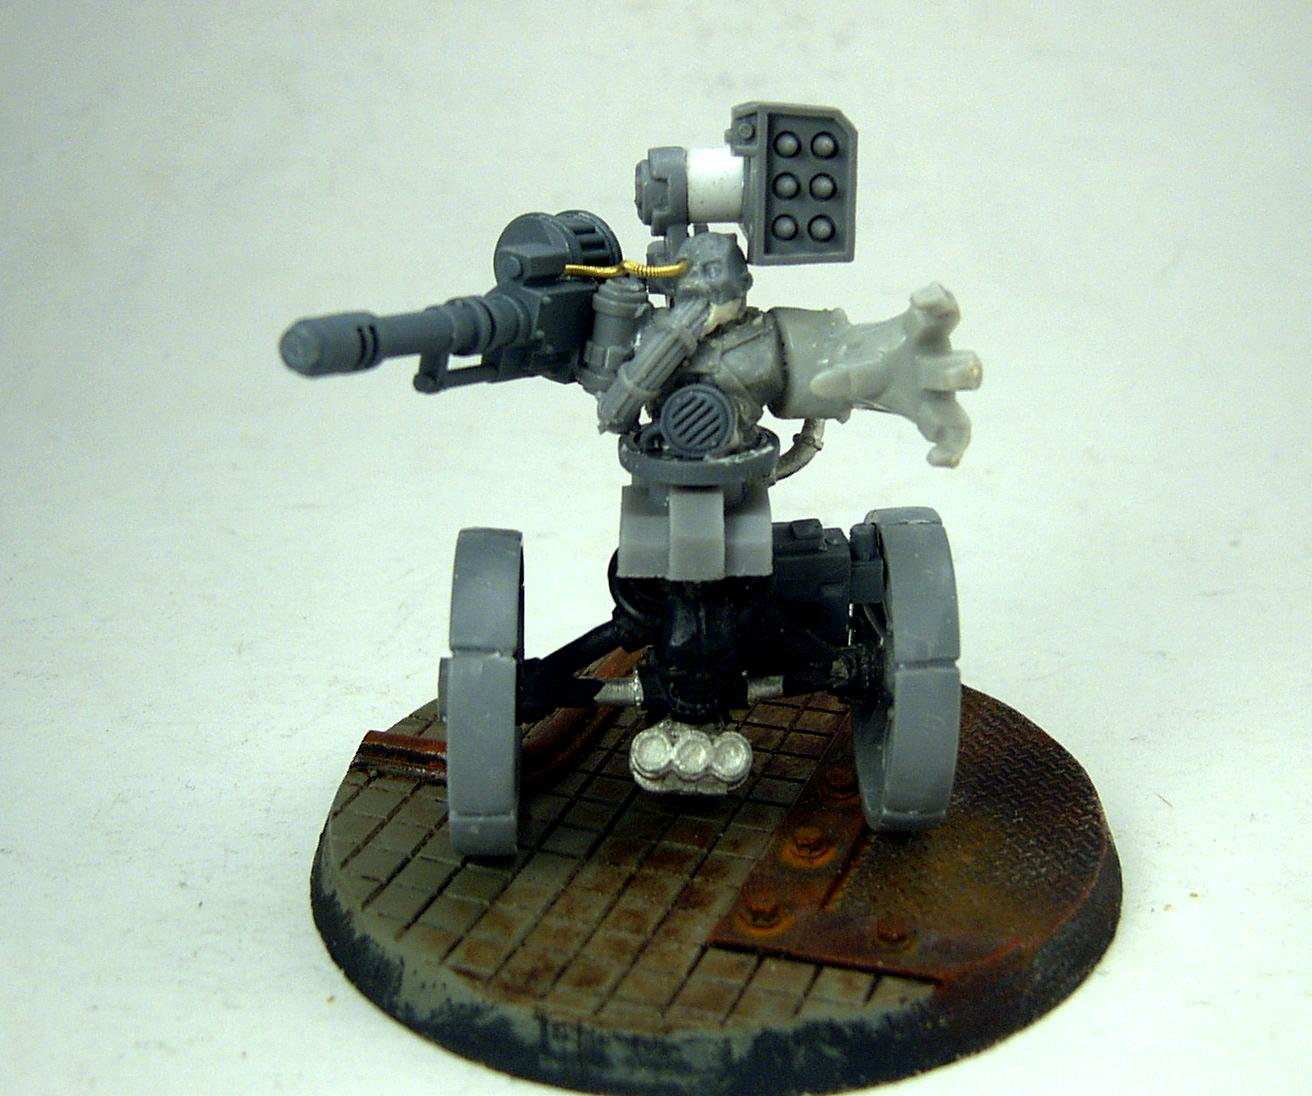 Adeptus Mechanicus, Auto-cannon, Automated, Grimdark, Rockets, Sentinel, Servitors